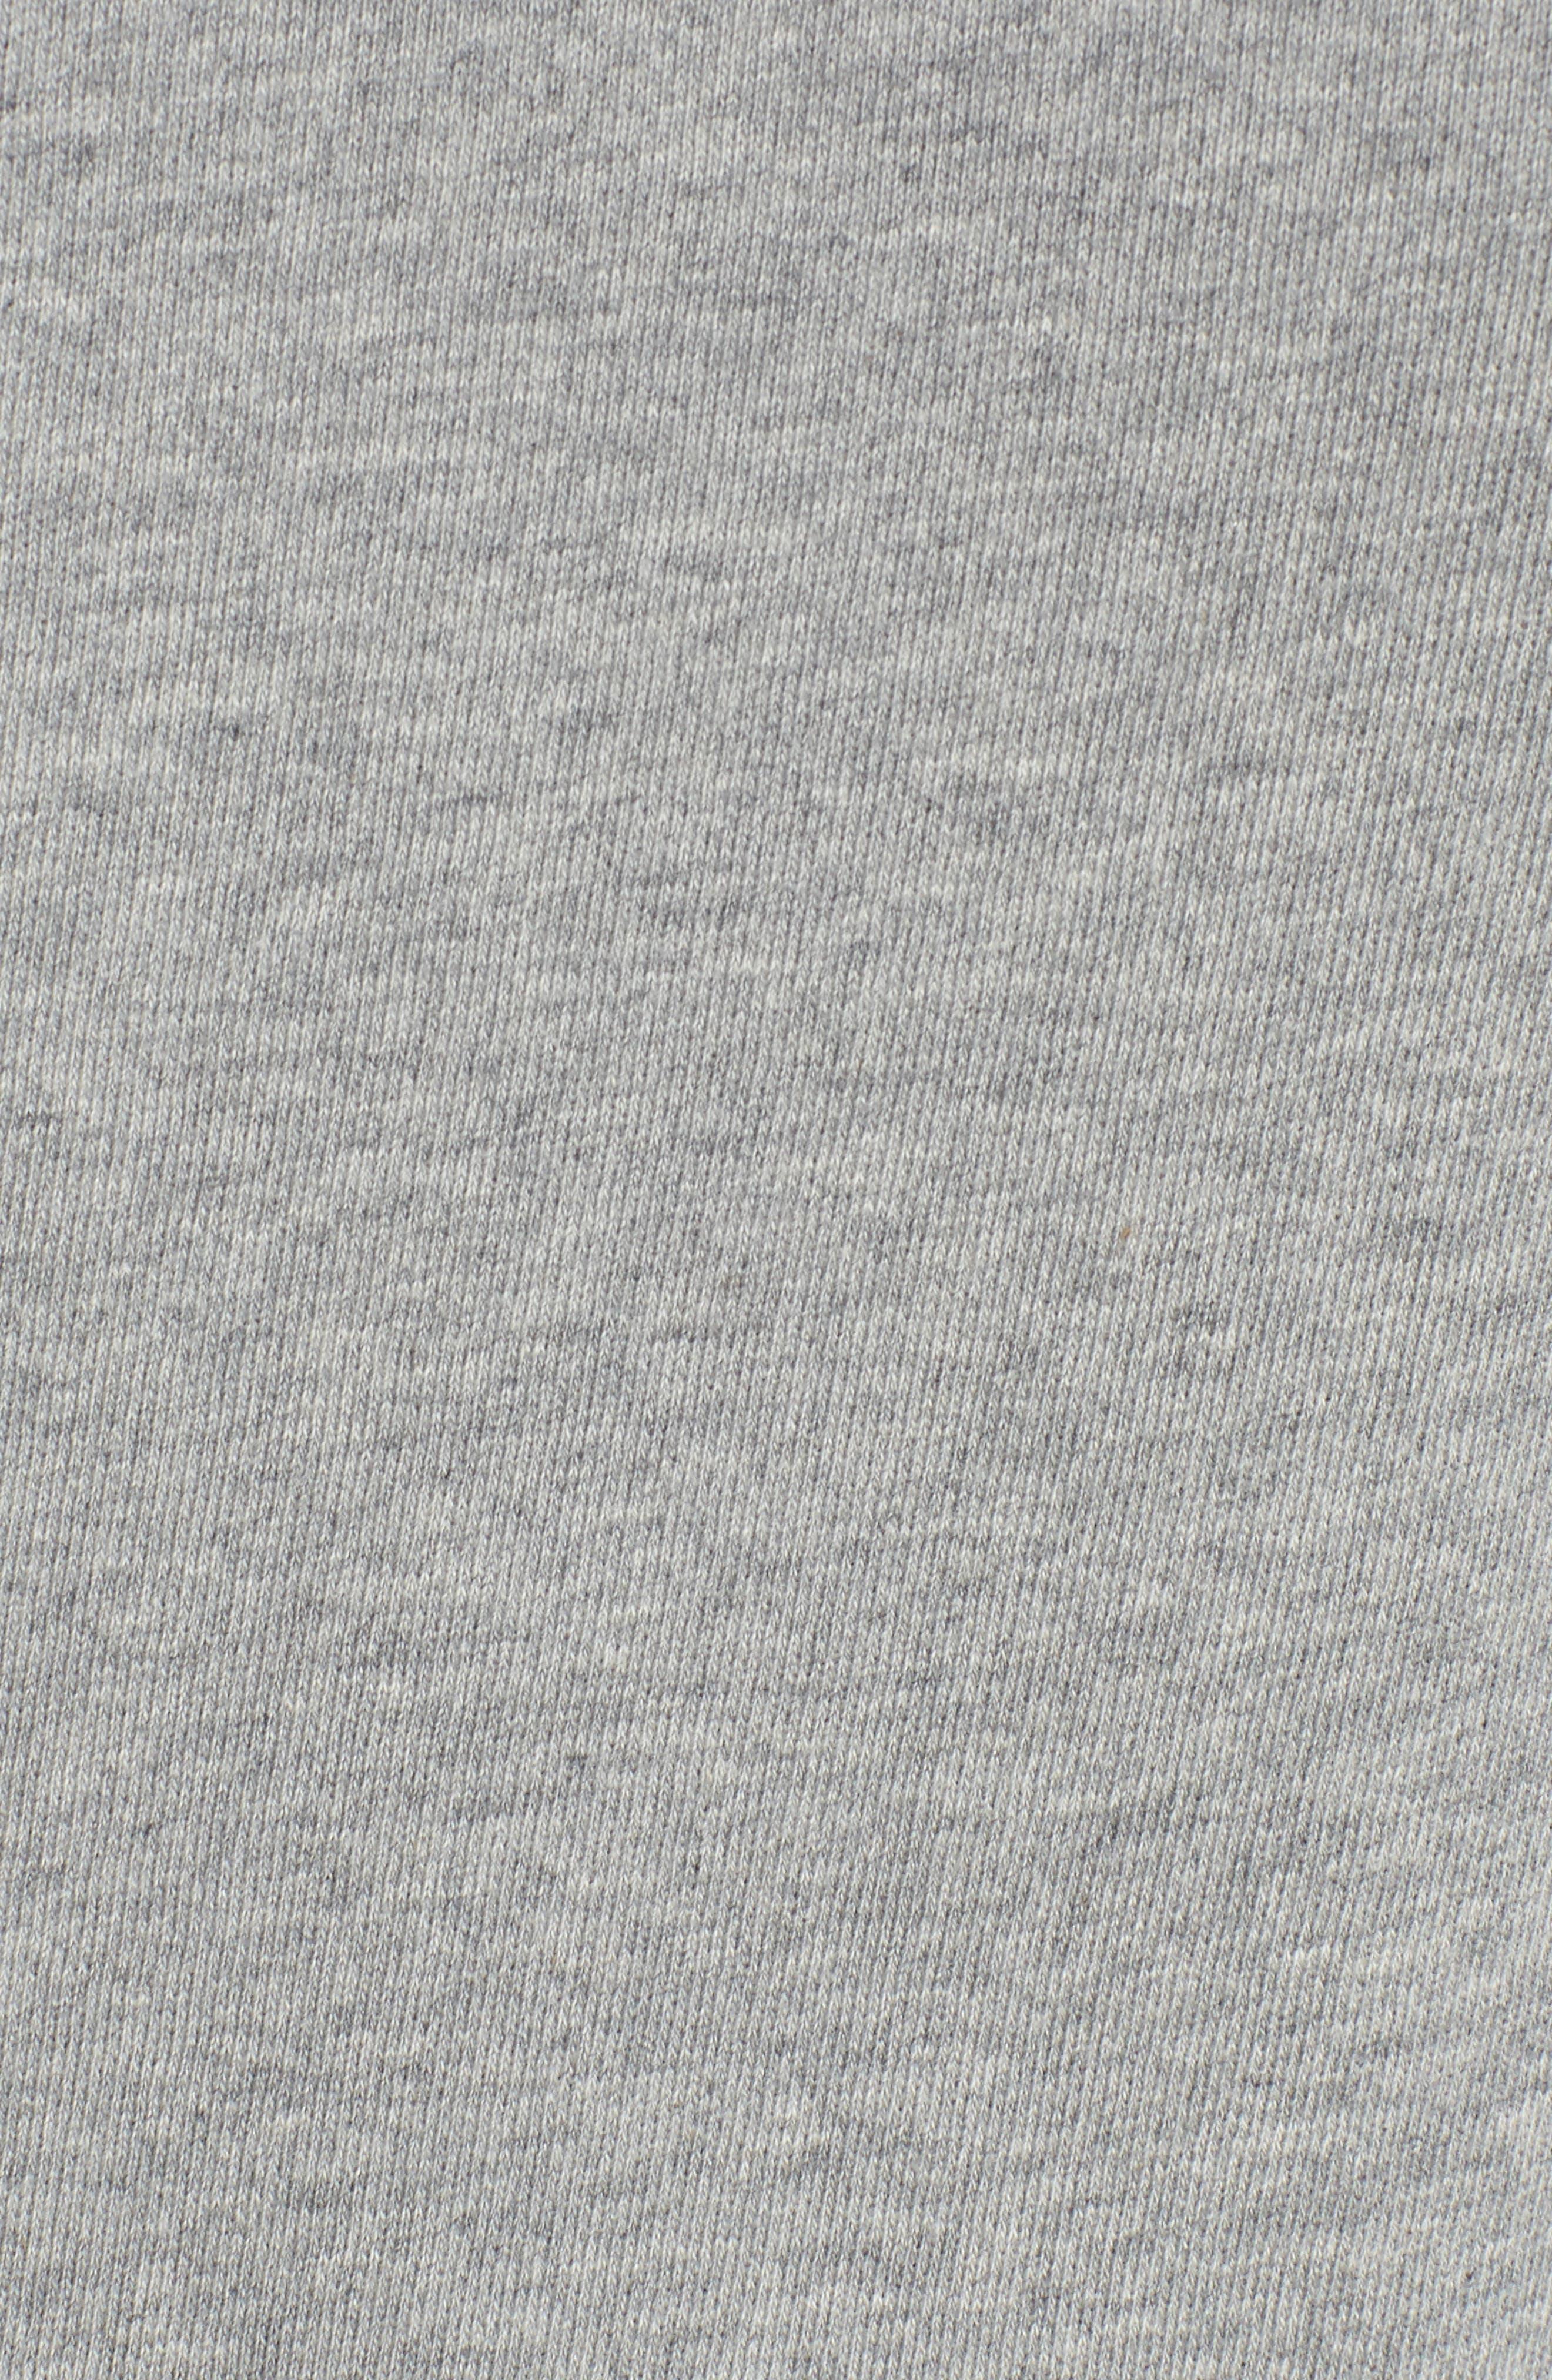 Ruffle Sweatshirt,                             Alternate thumbnail 5, color,                             031